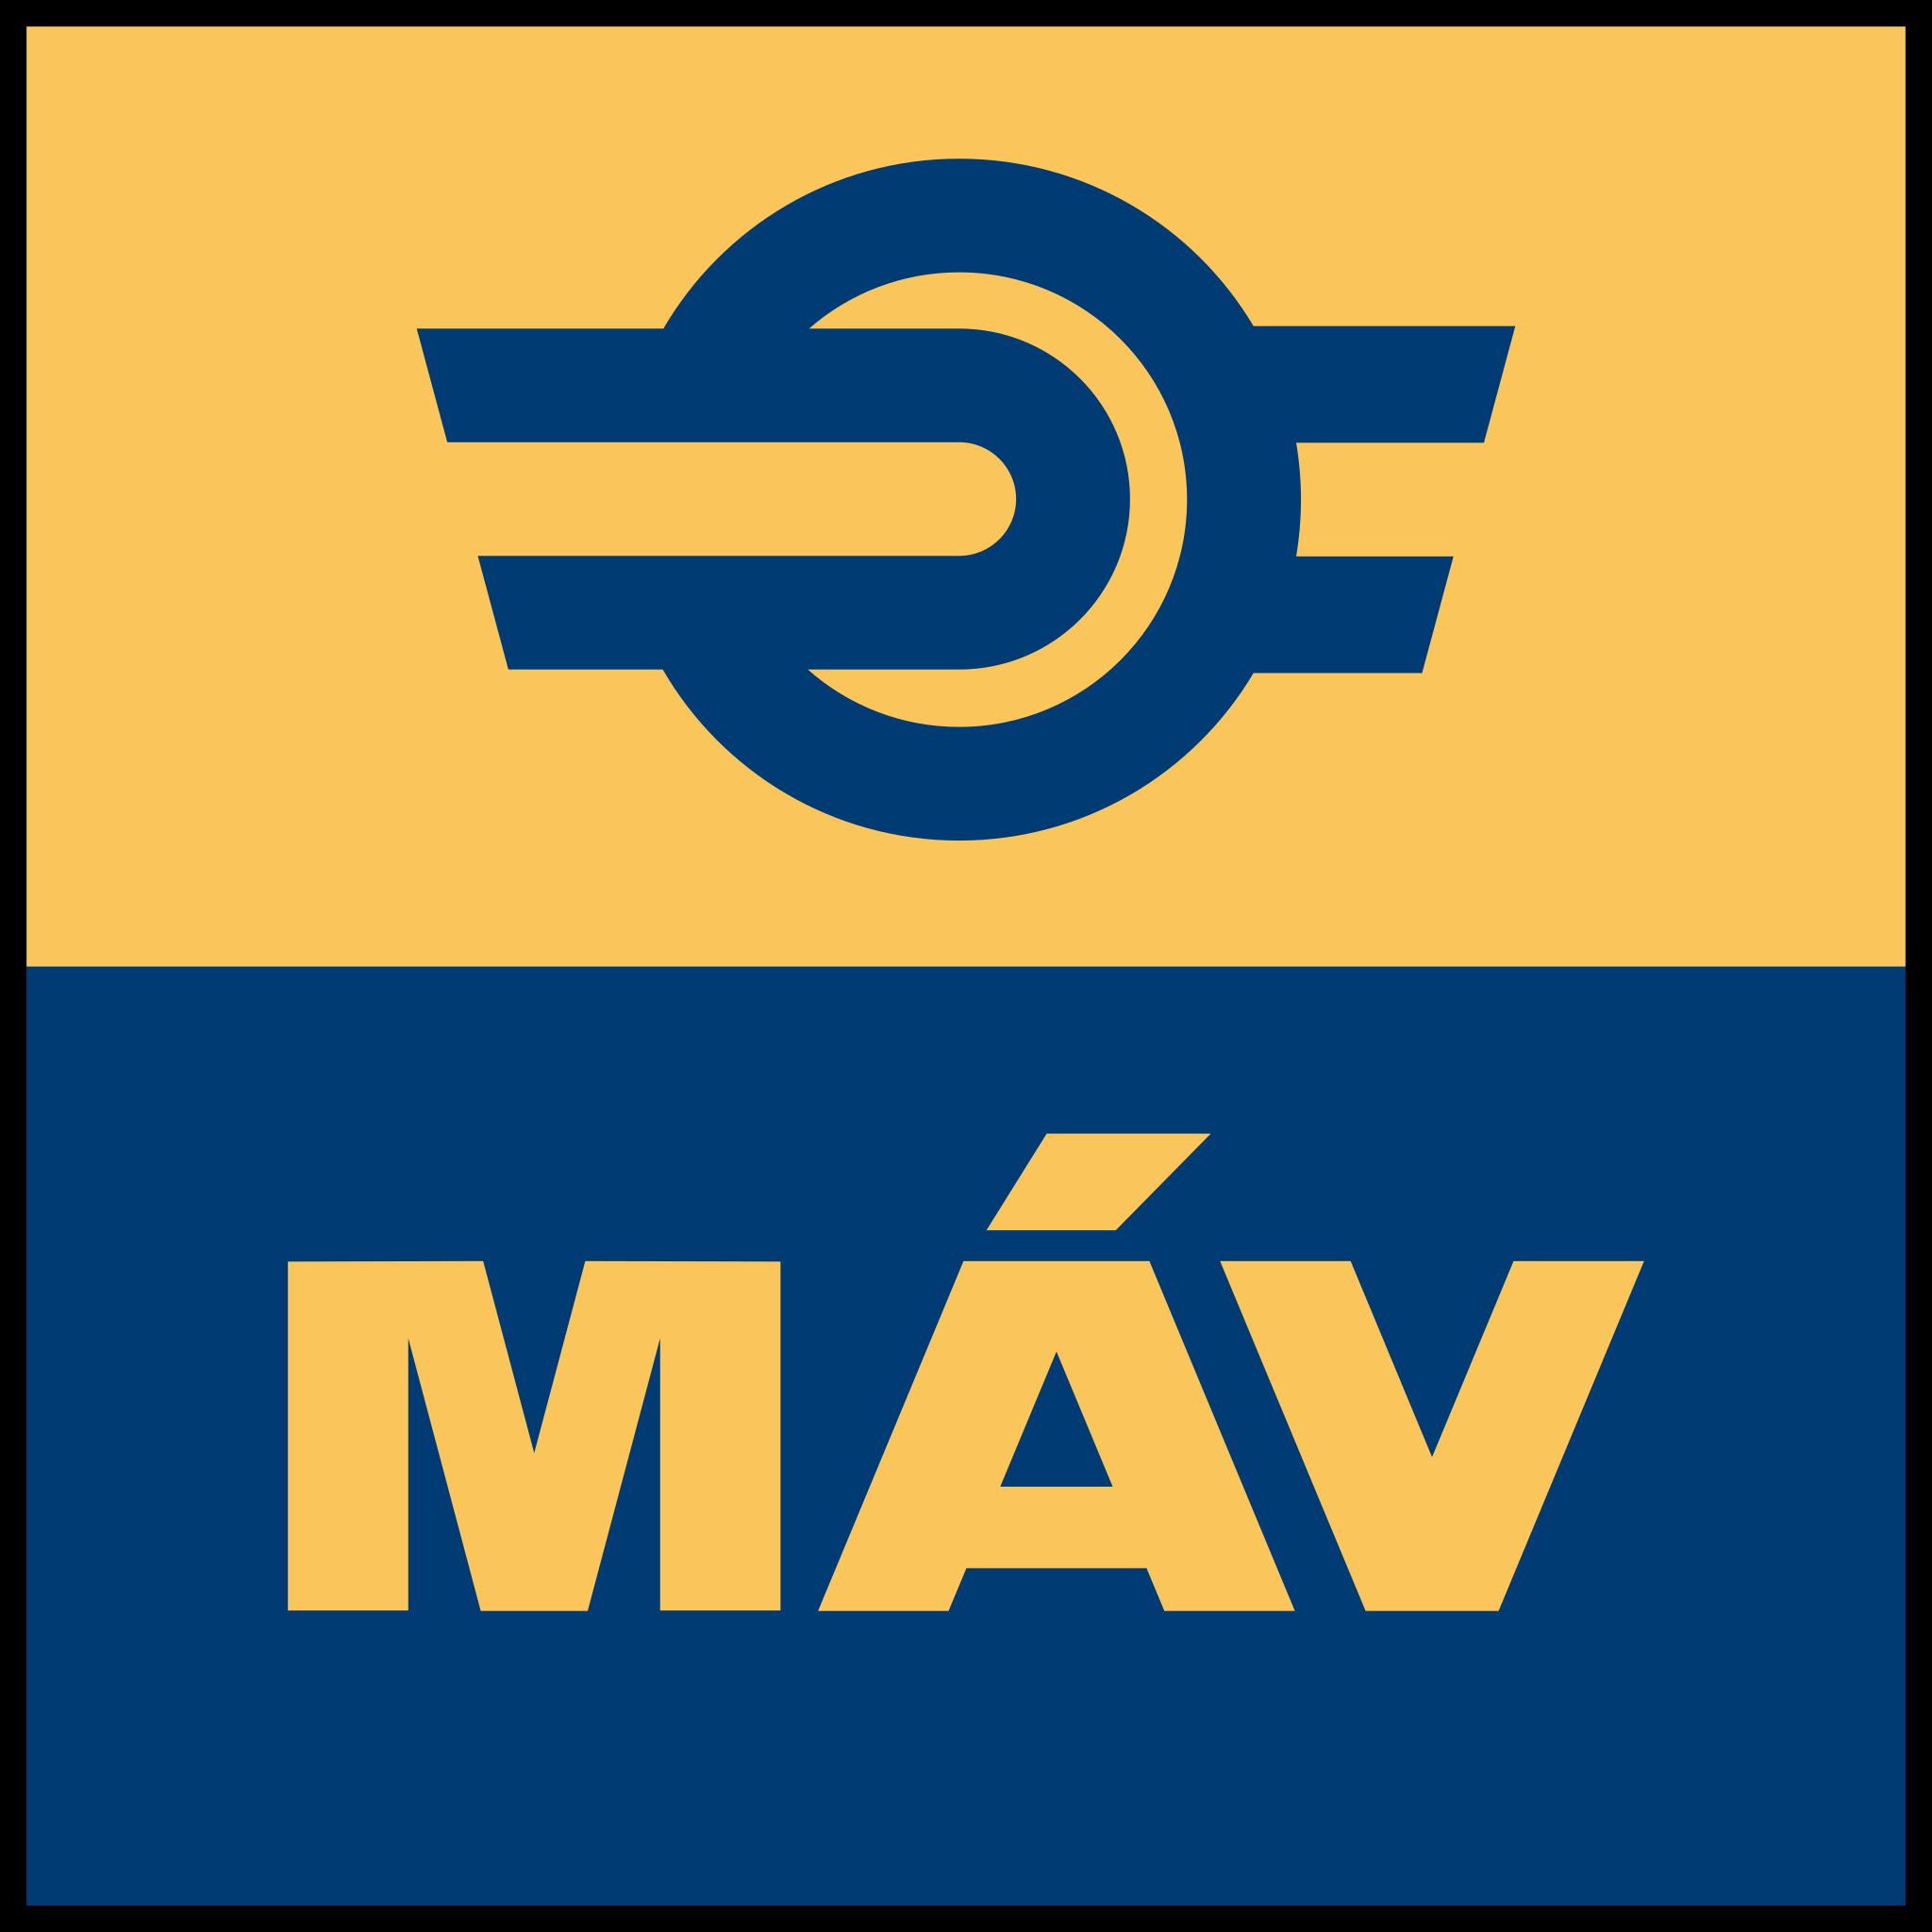 MAV匈牙利國鐵,可以線上訂票現場取票。